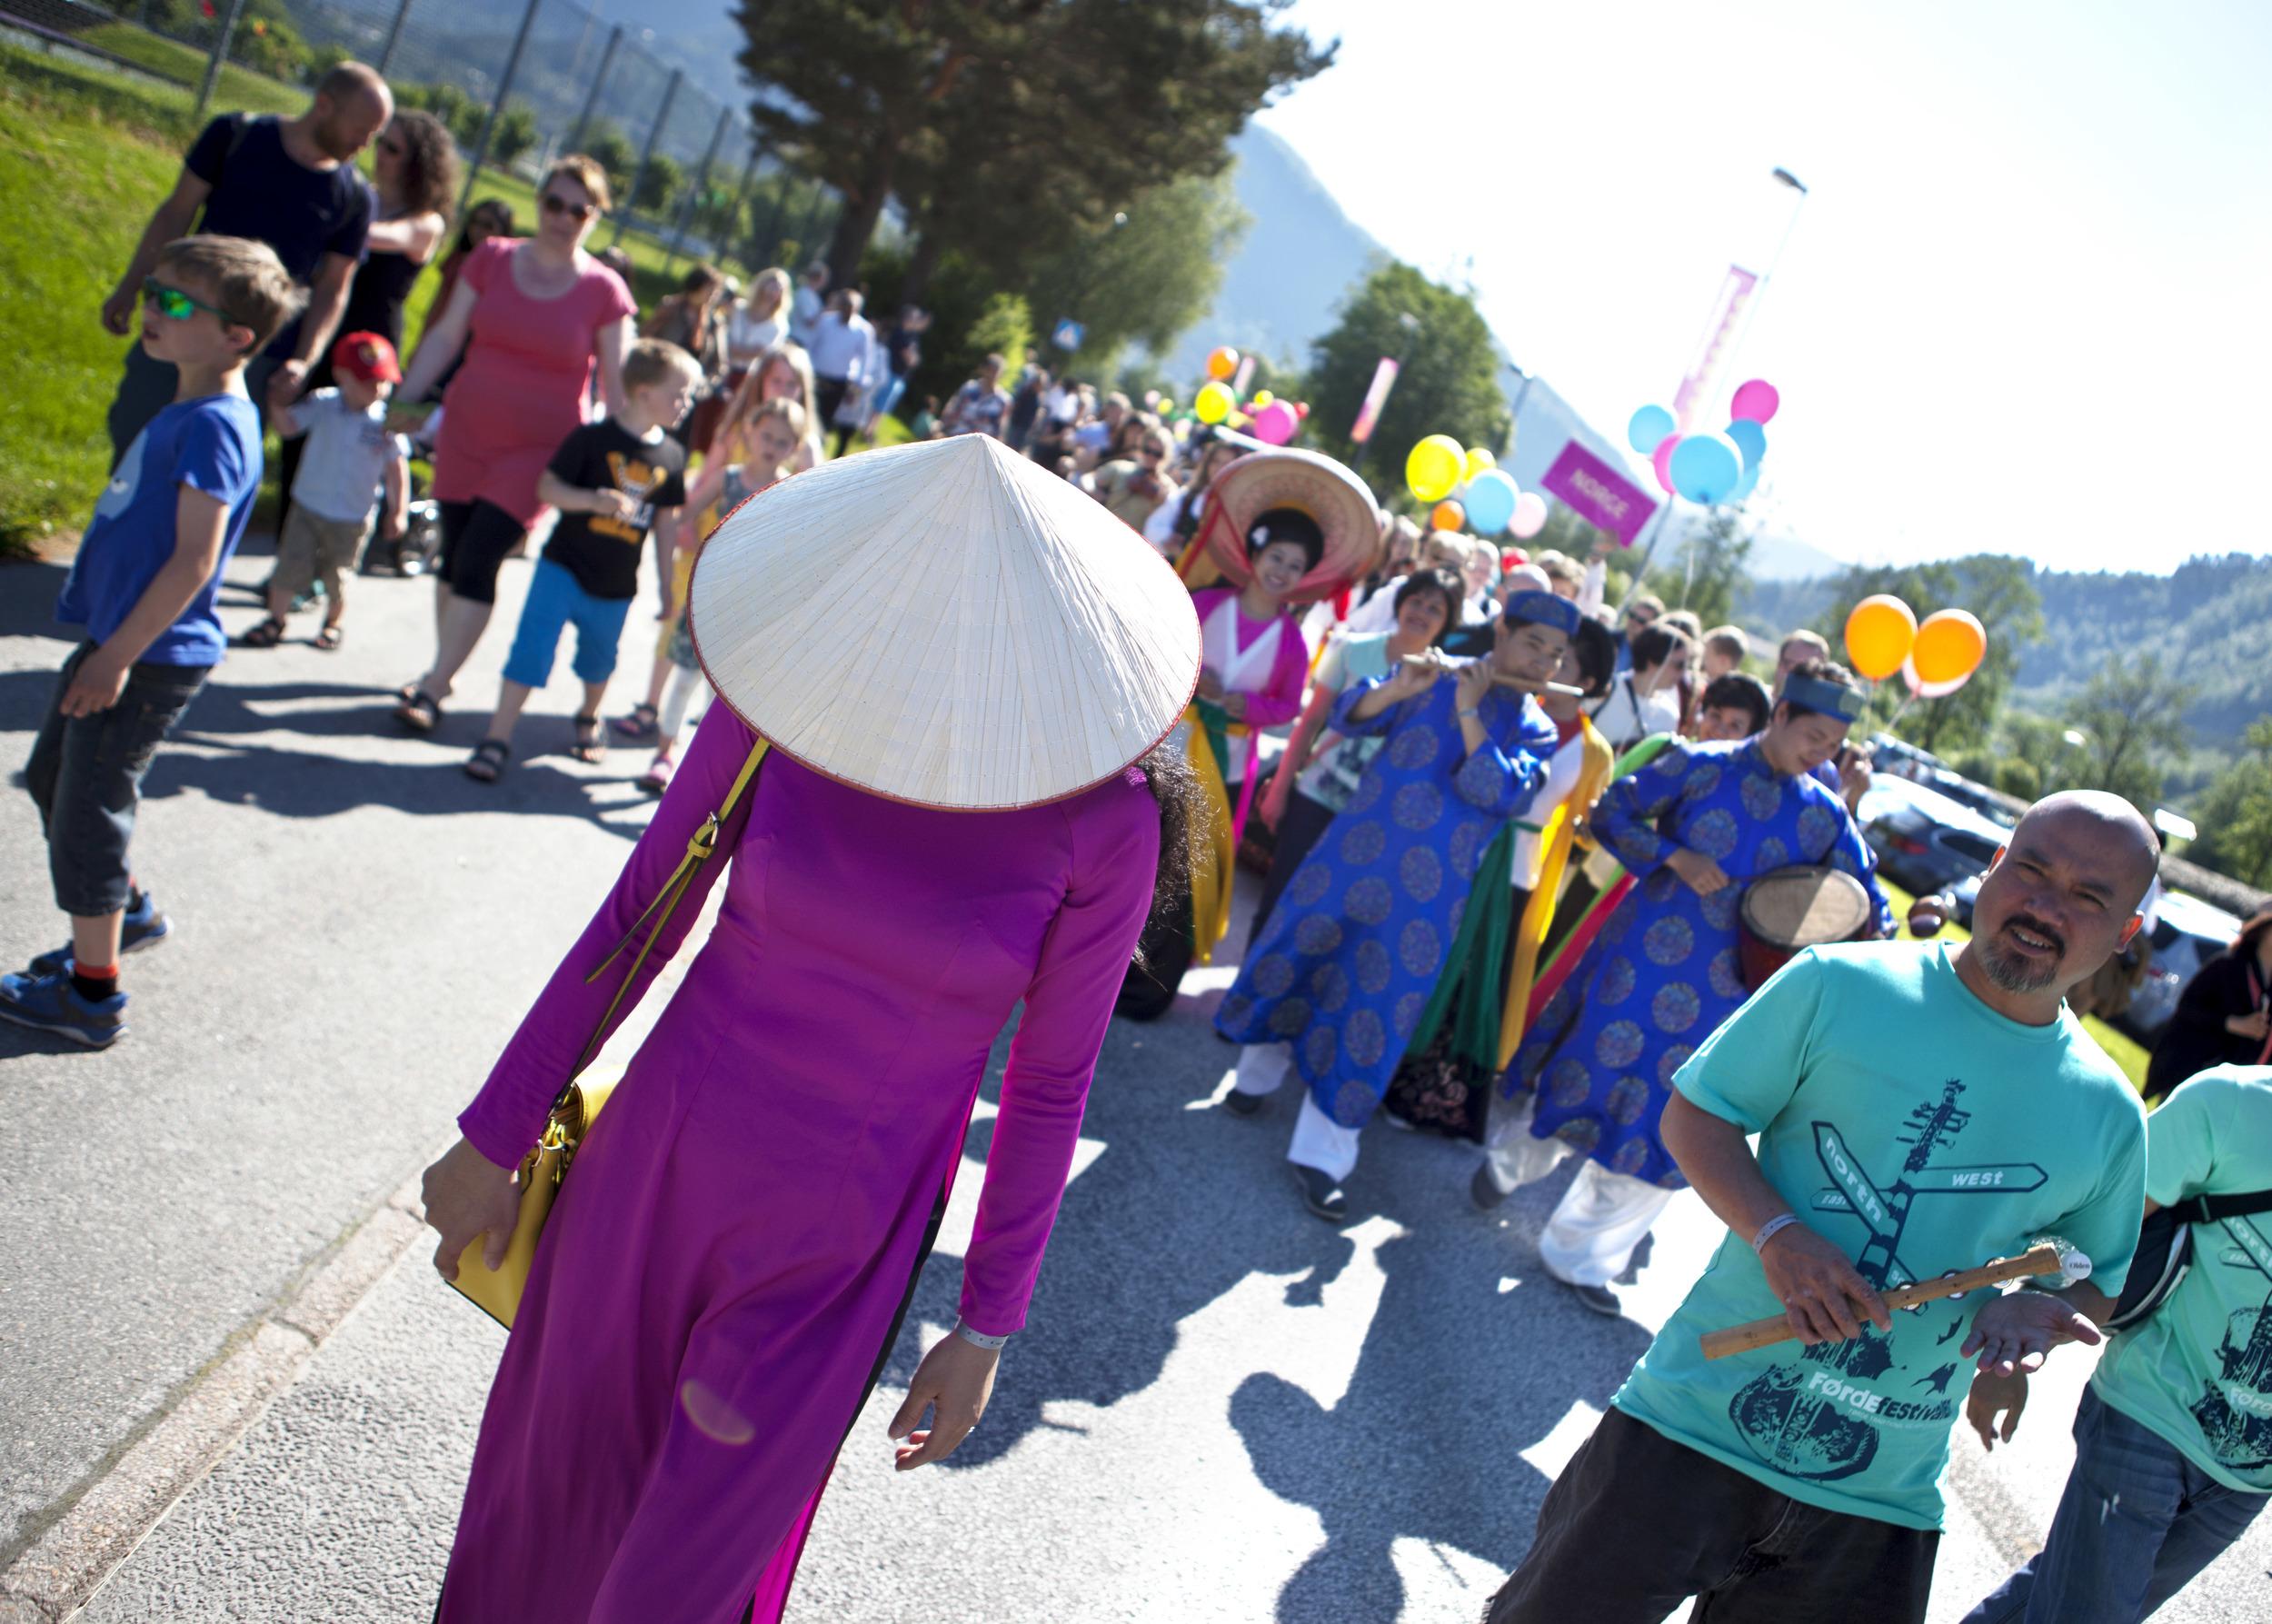 festivalparaden - heidi hattestein -IMG_4805.jpg